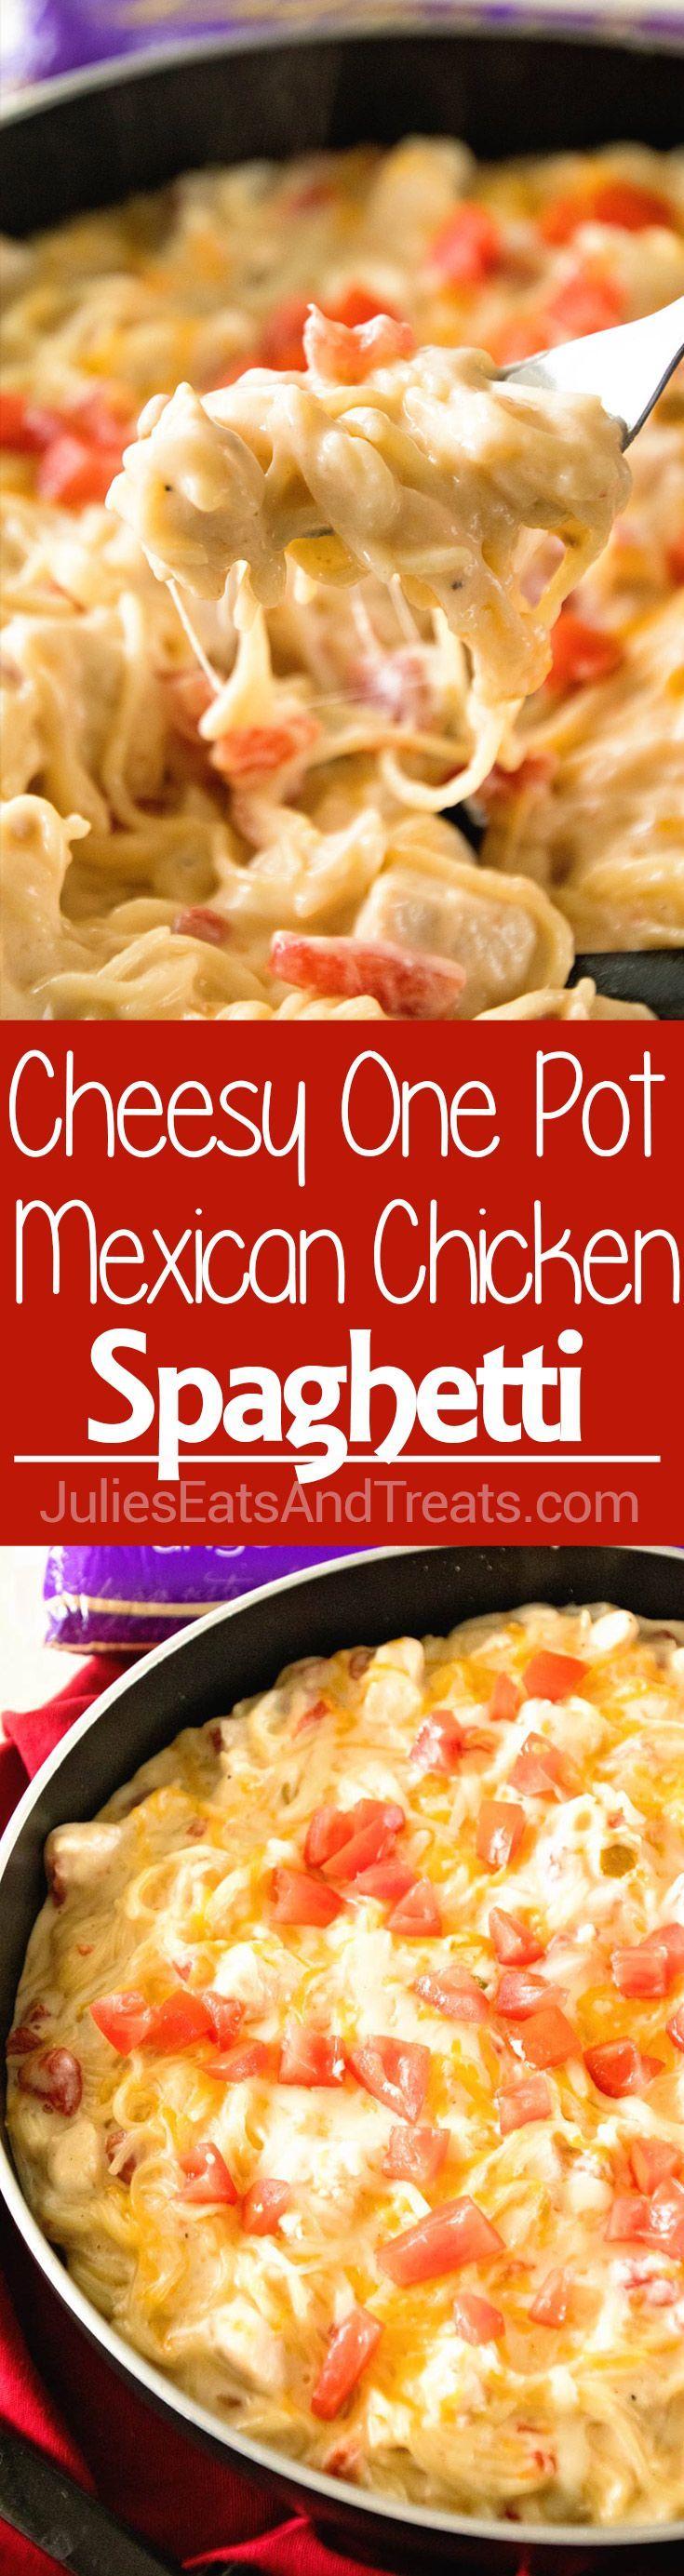 One Pot Mexican Chicken Spaghetti ~ Delicious One Pot Pasta Recipe with Mexican Flavor! Creamy, Mexican Chicken Spaghetti Recipe with a Kick is on the Table in 30 Minutes! via @julieseats @DaVinciPasta, #EndlessPastabilities #PastaPersonalitiesju